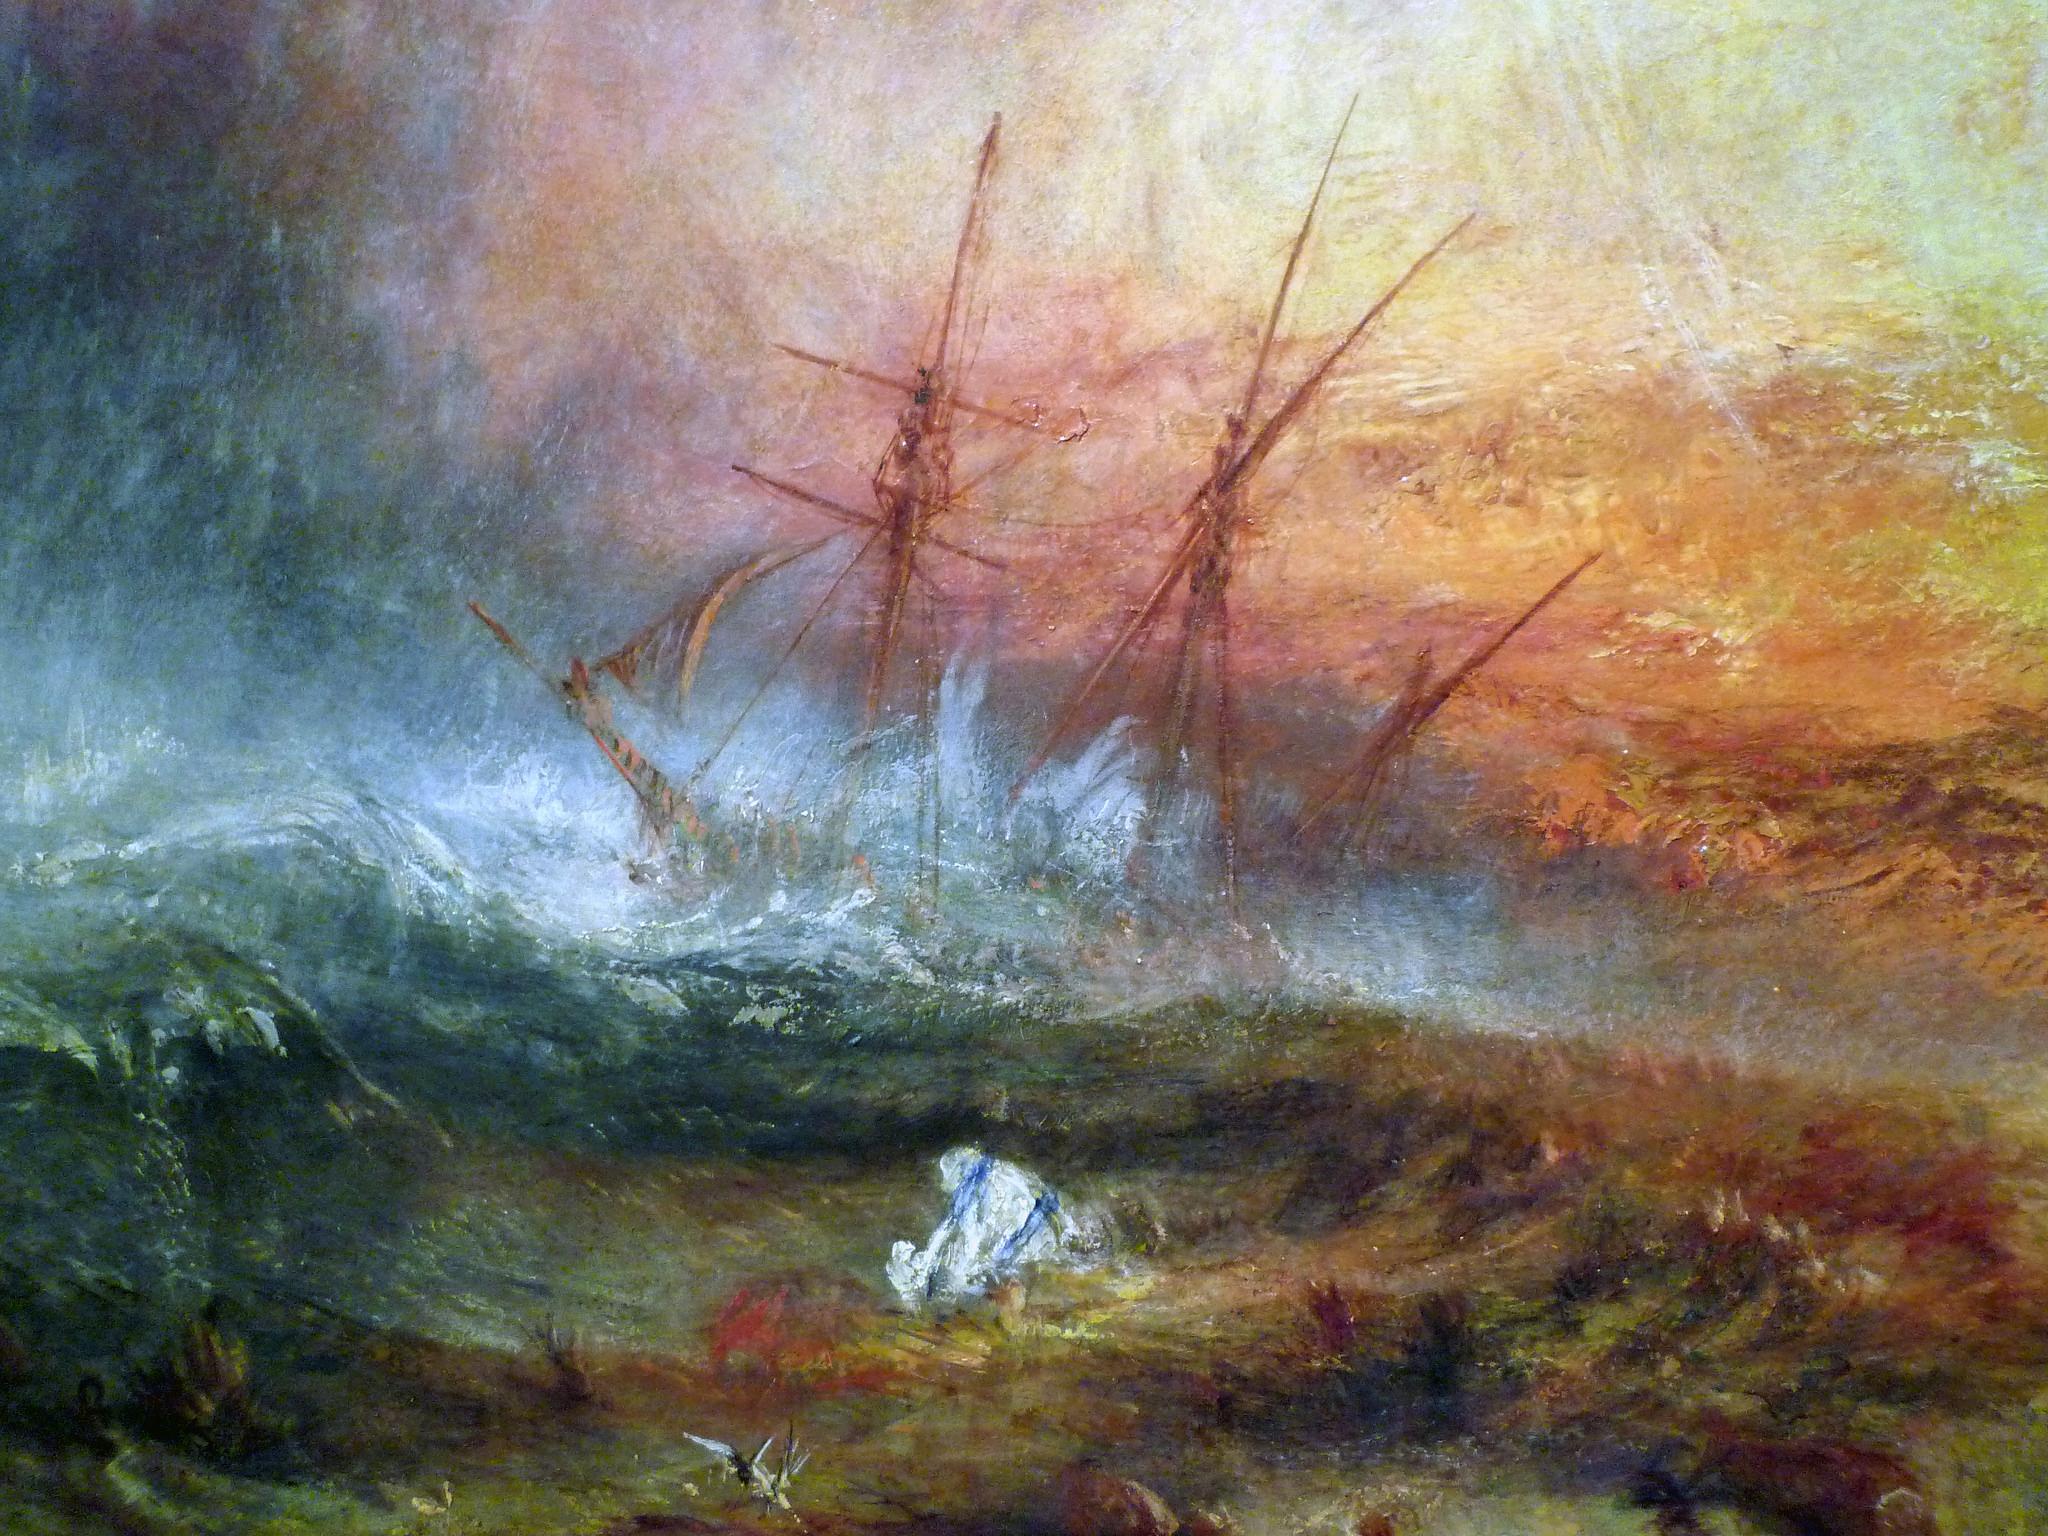 """The Slave Ship"" detail"